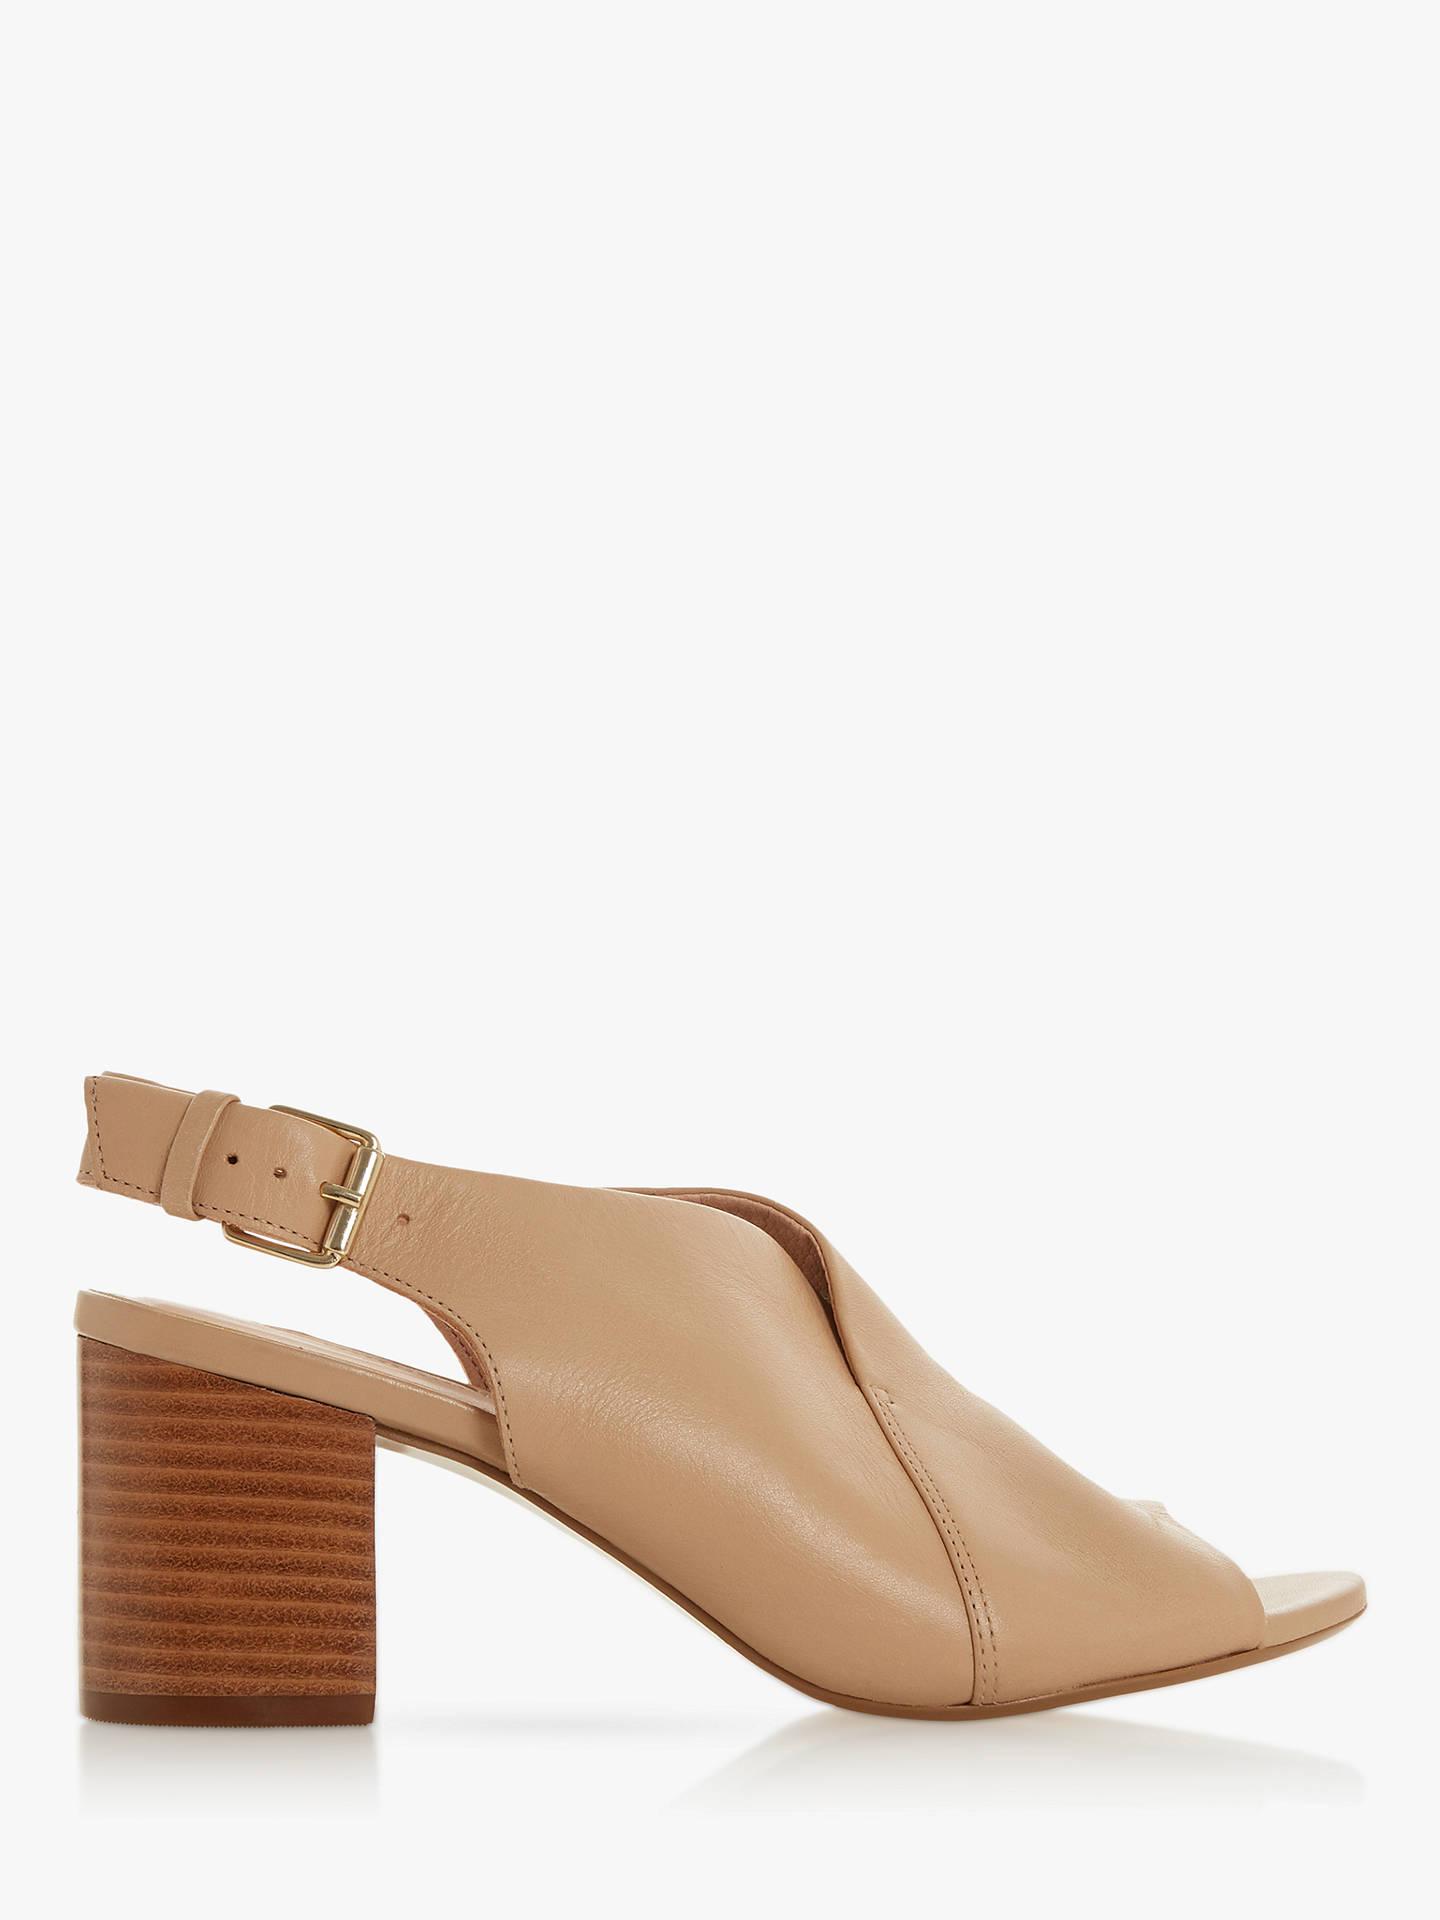 3556674f6f5 Dune Ignus Block Heel Slingback Sandals at John Lewis   Partners